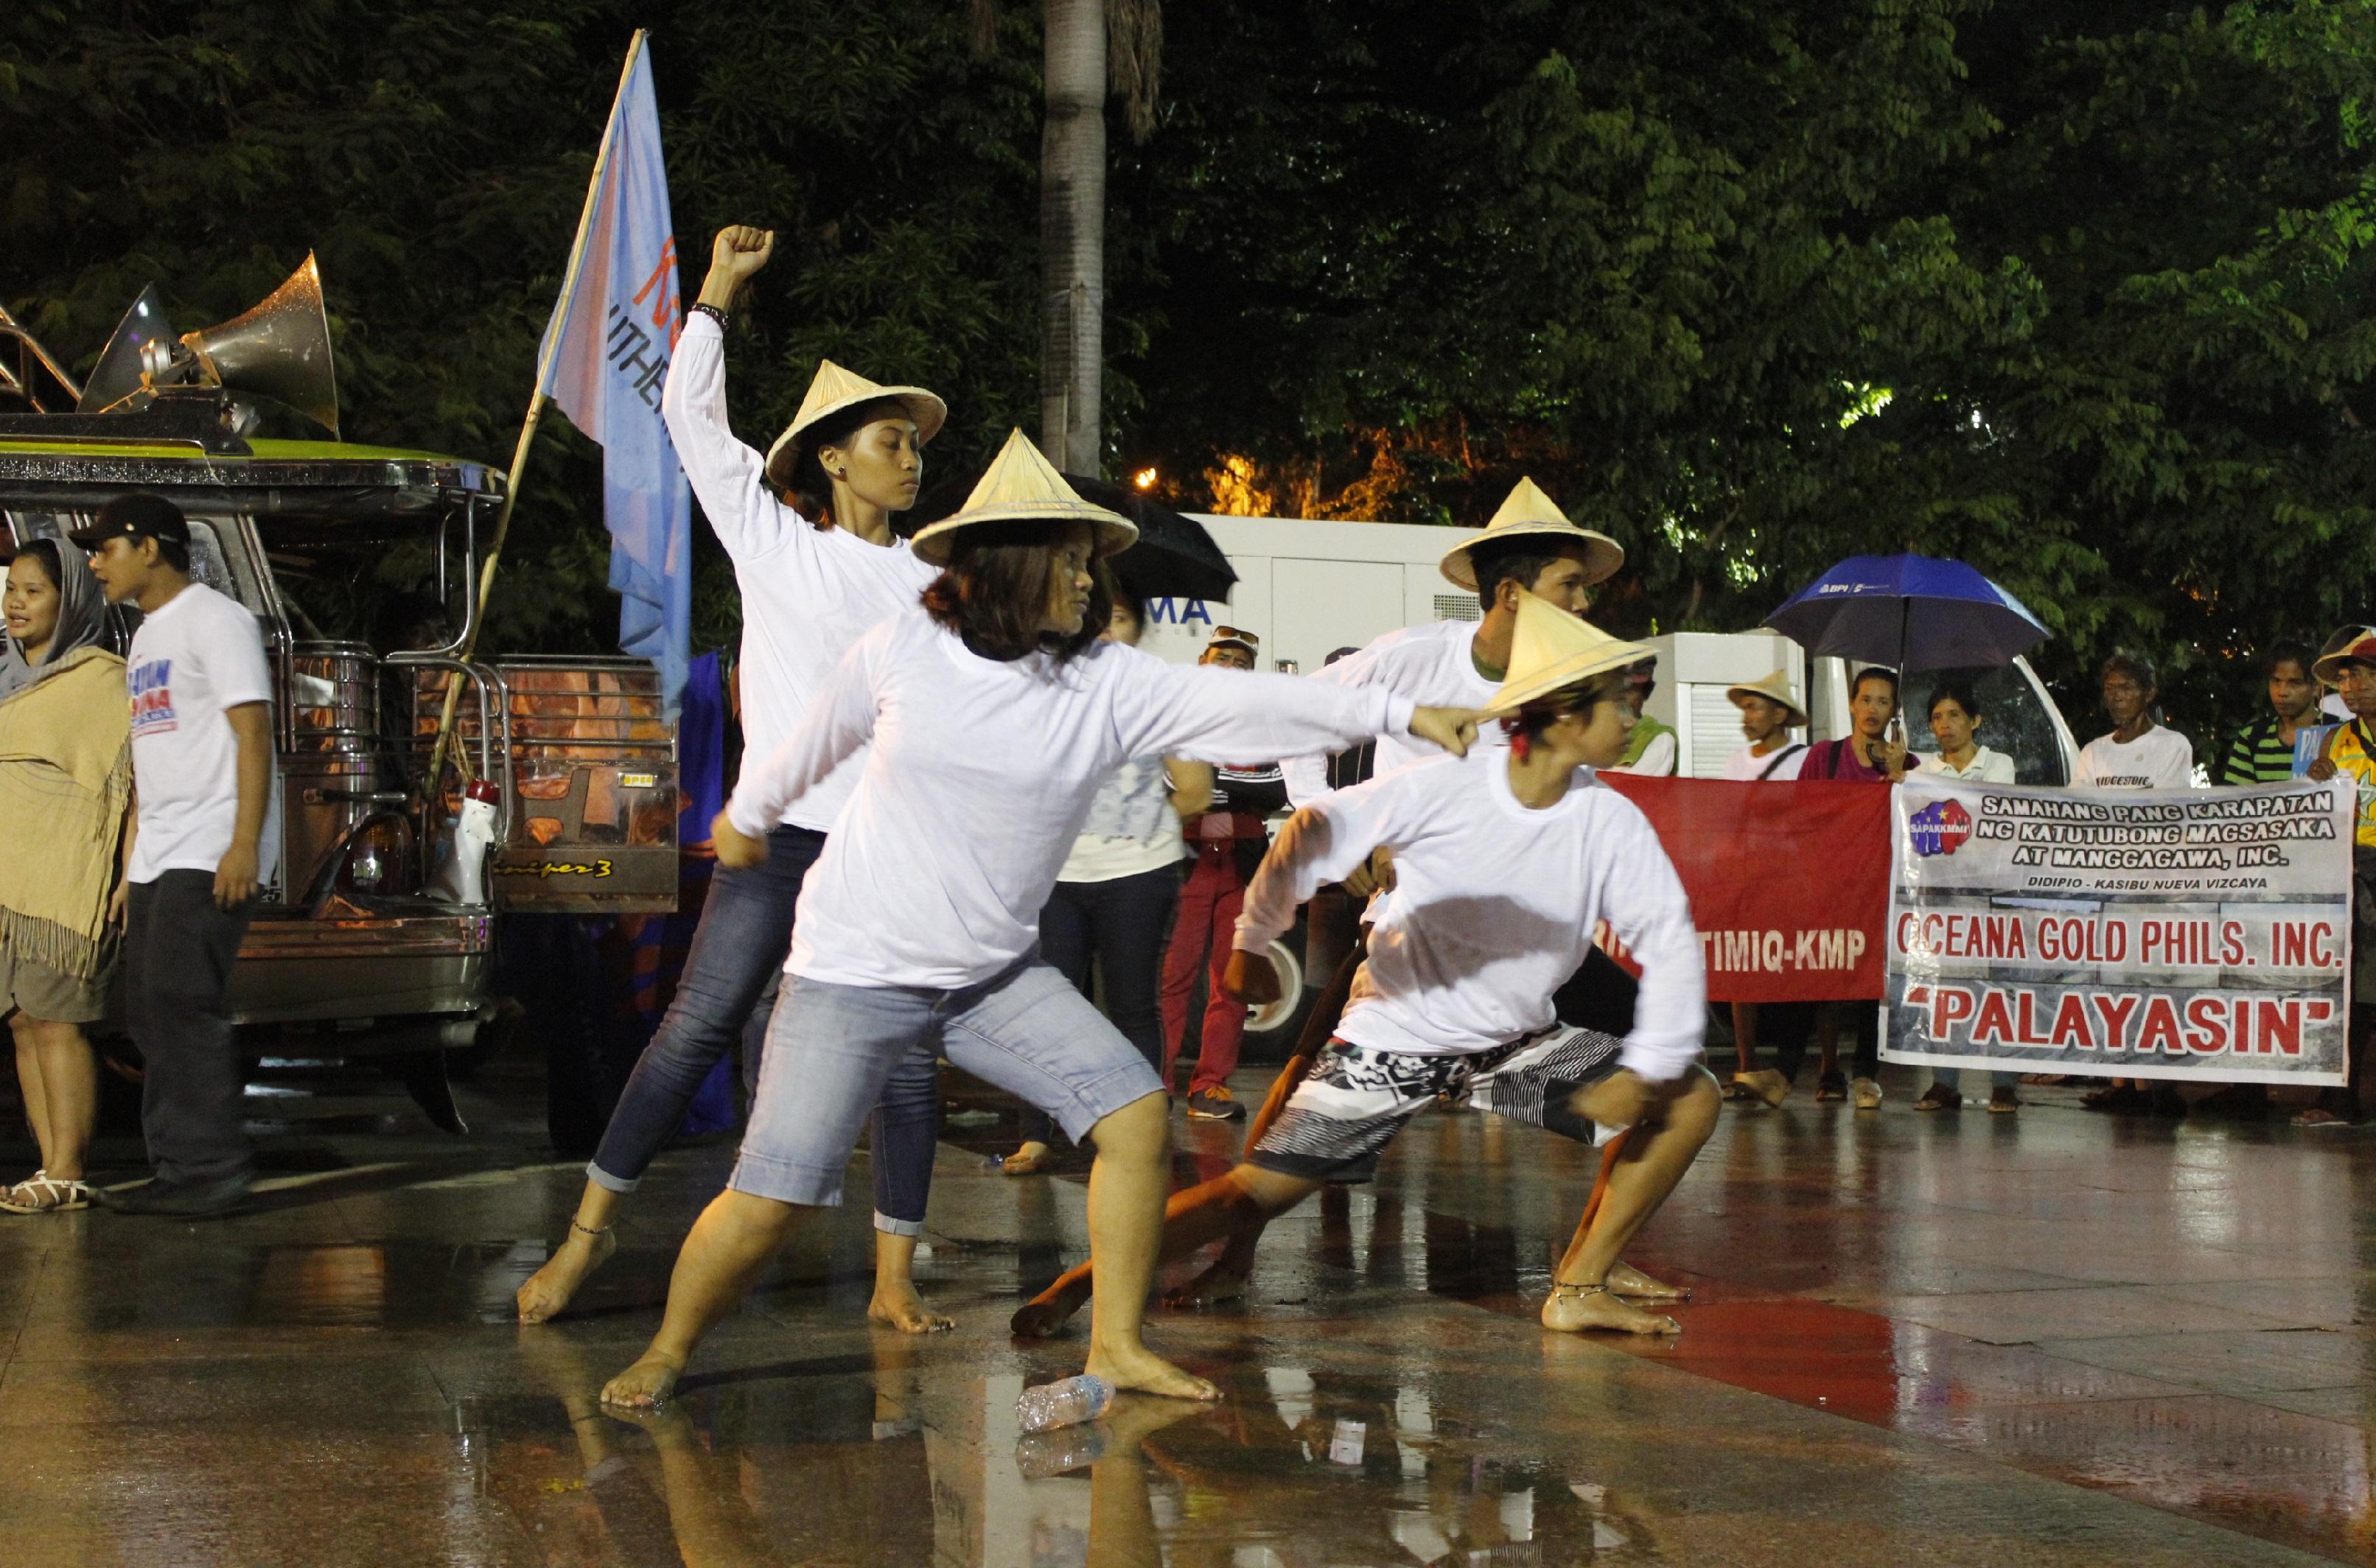 (Photo by Karen Ann Macalalad/Bulatlat)